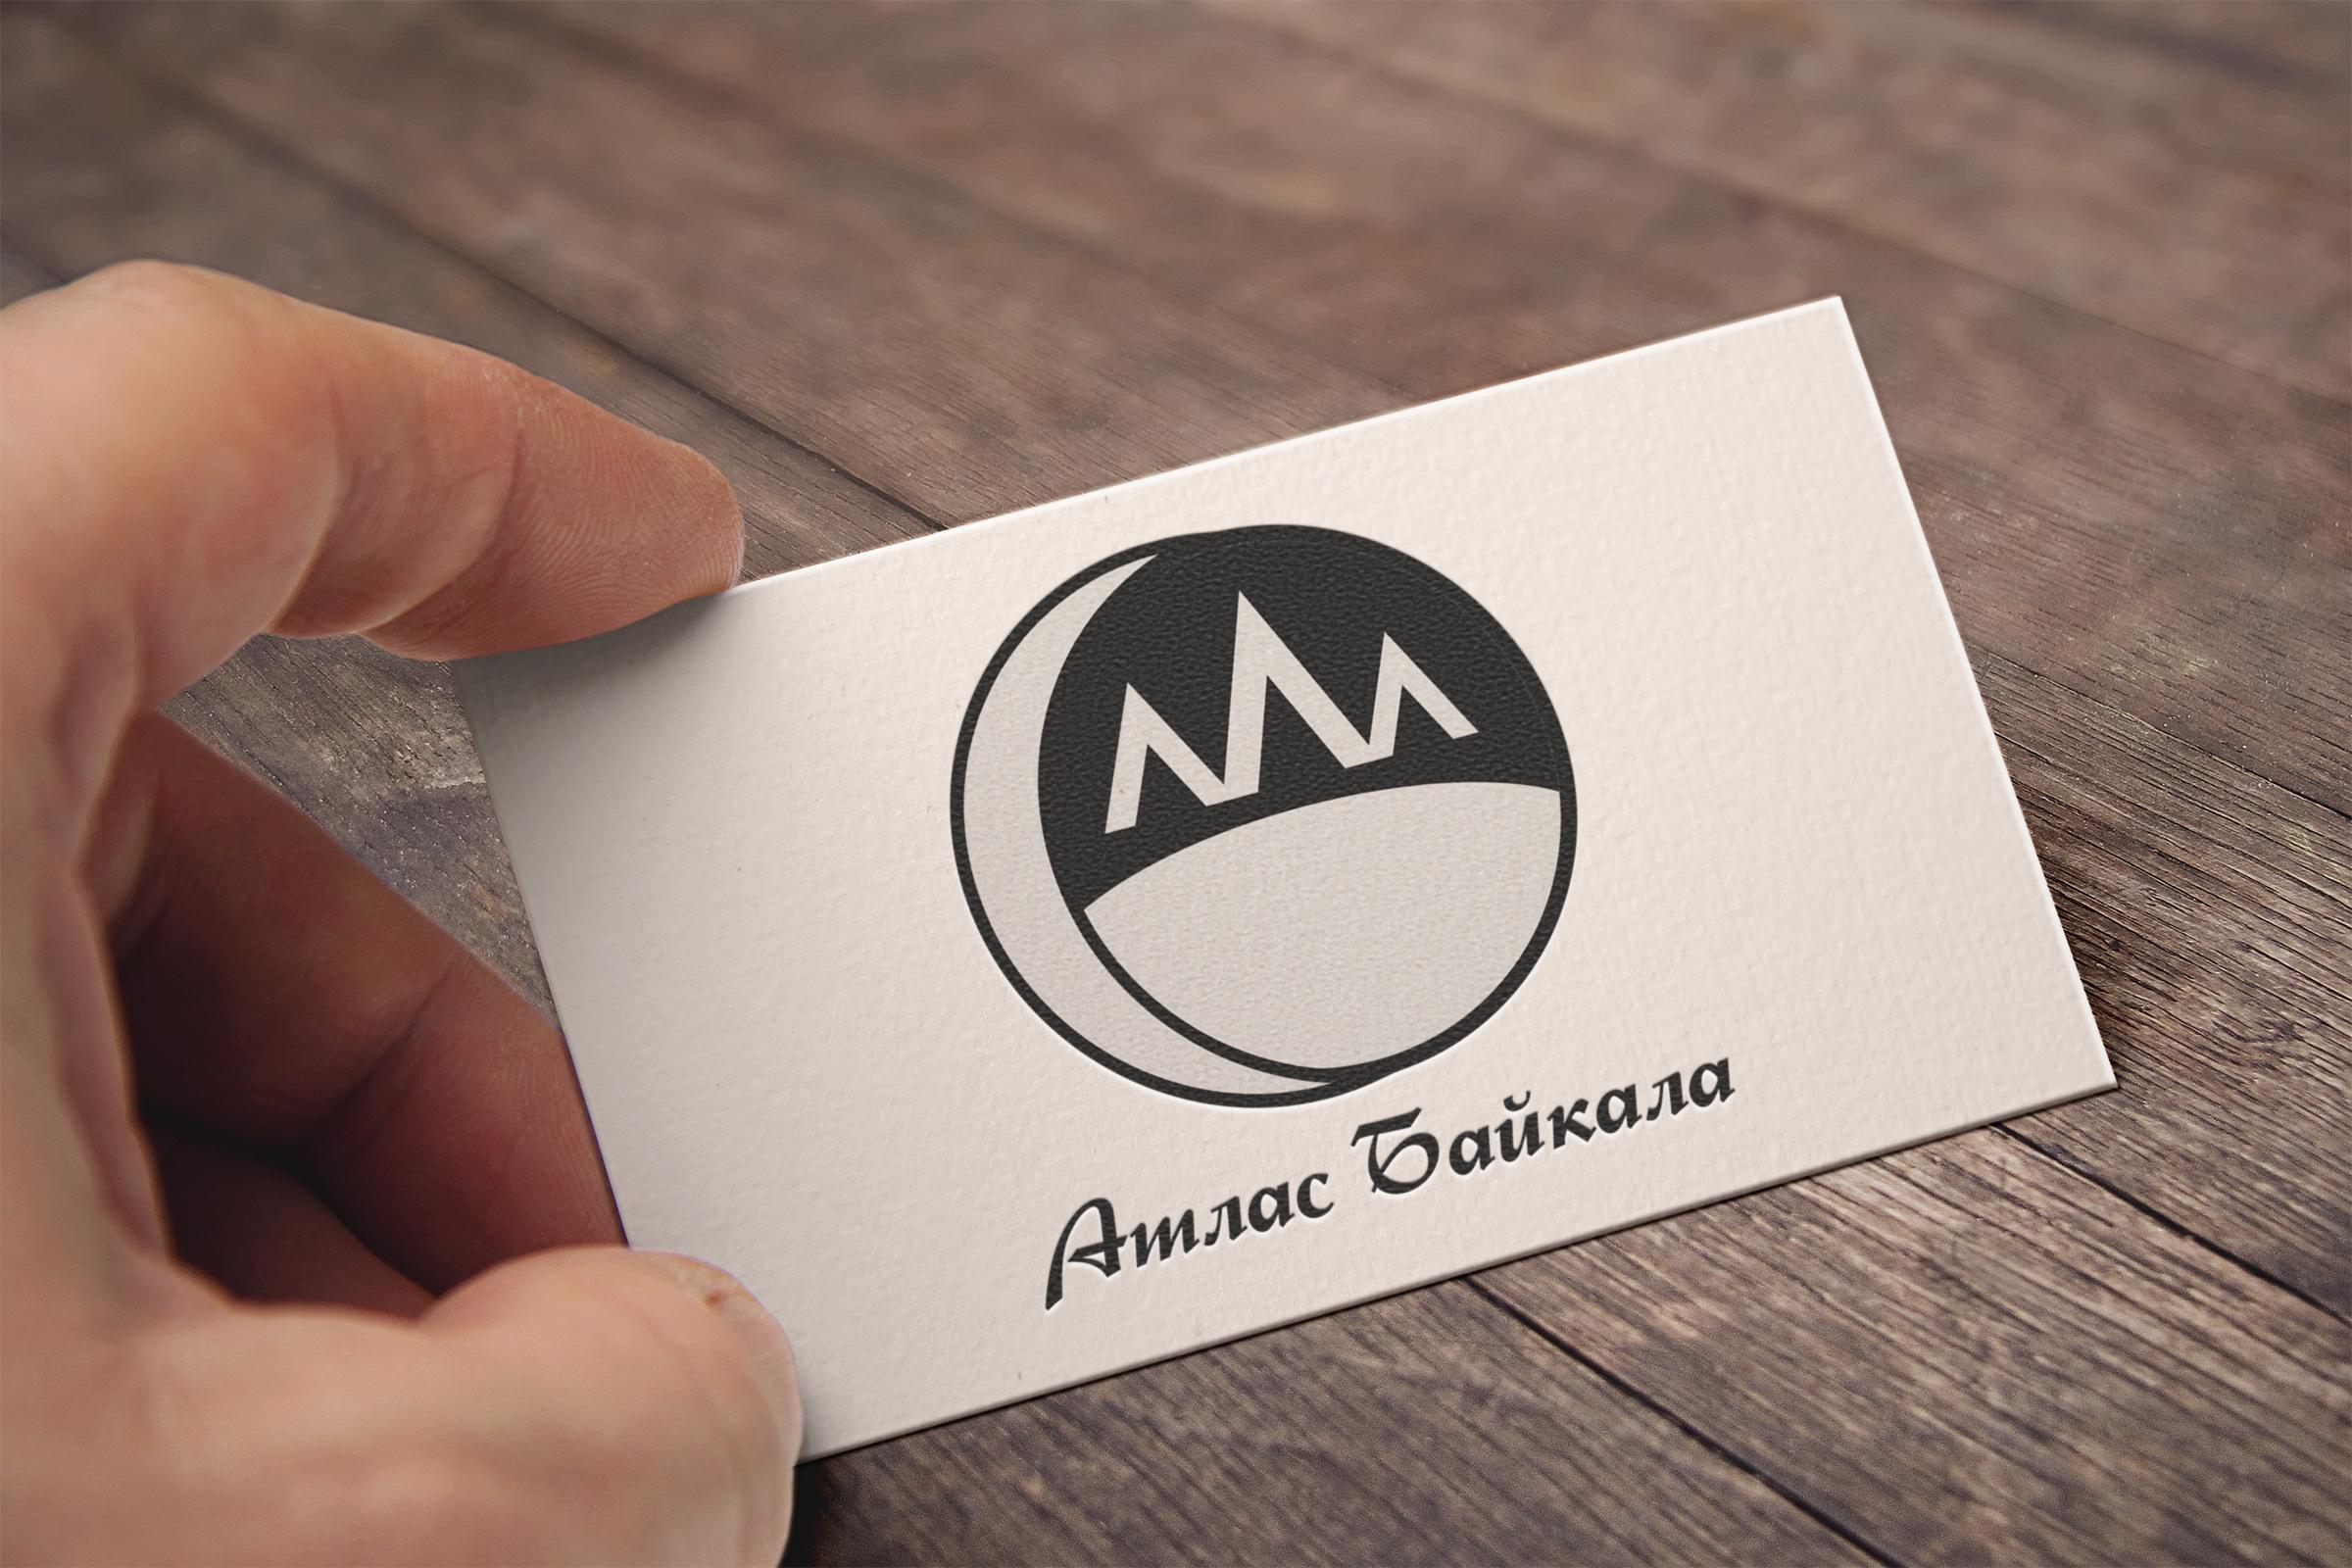 Разработка логотипа Атлас Байкала фото f_4975af97c99f1ee3.jpg